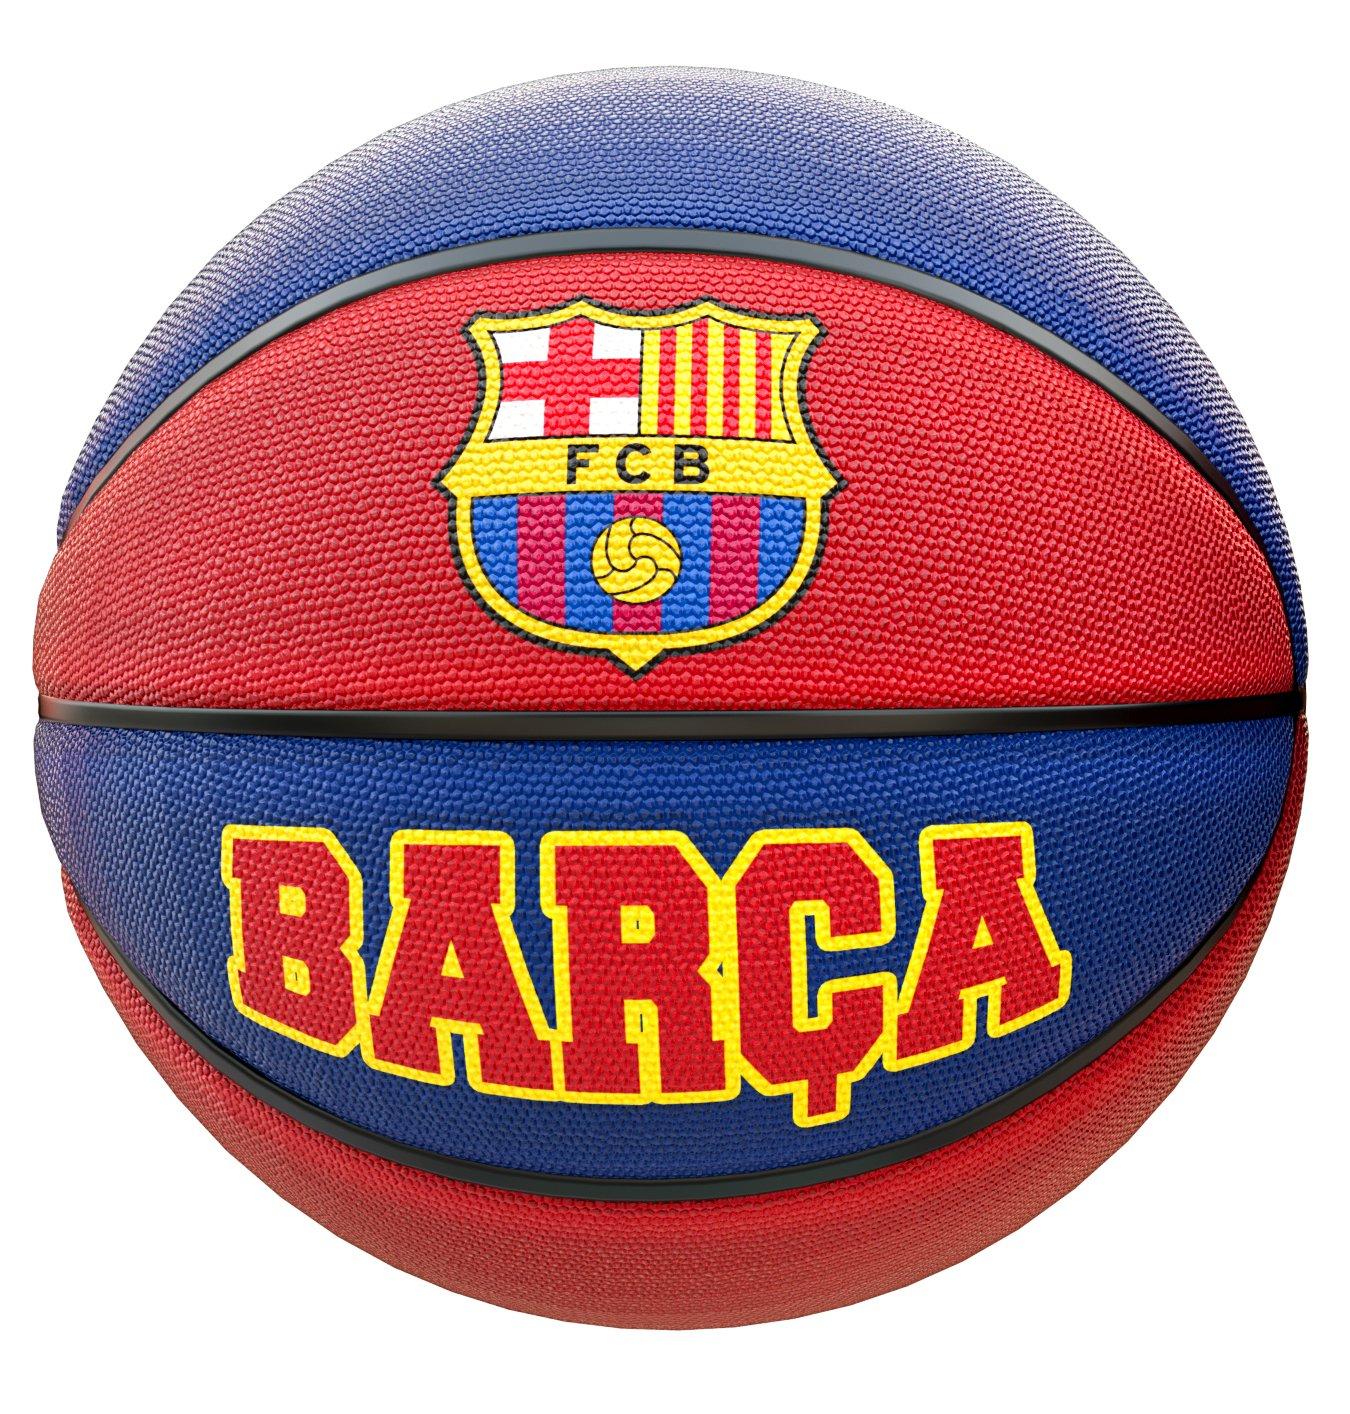 Balon Basket Oficial FC Barcelona Josma Sport Gol 2000